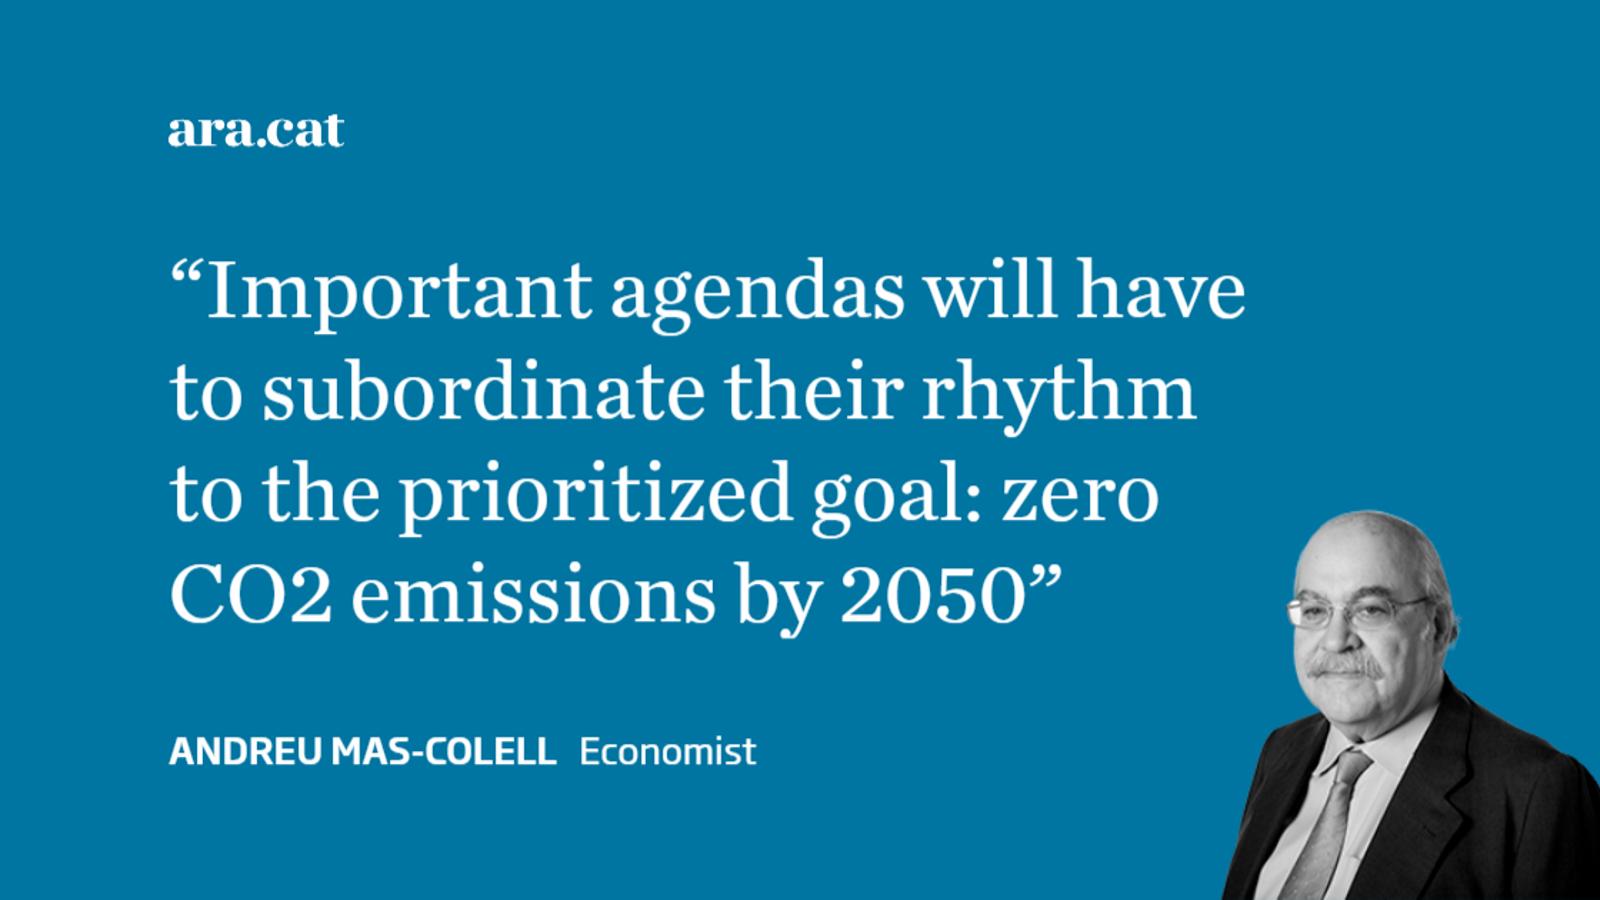 Climate emergency: the EU has set the date